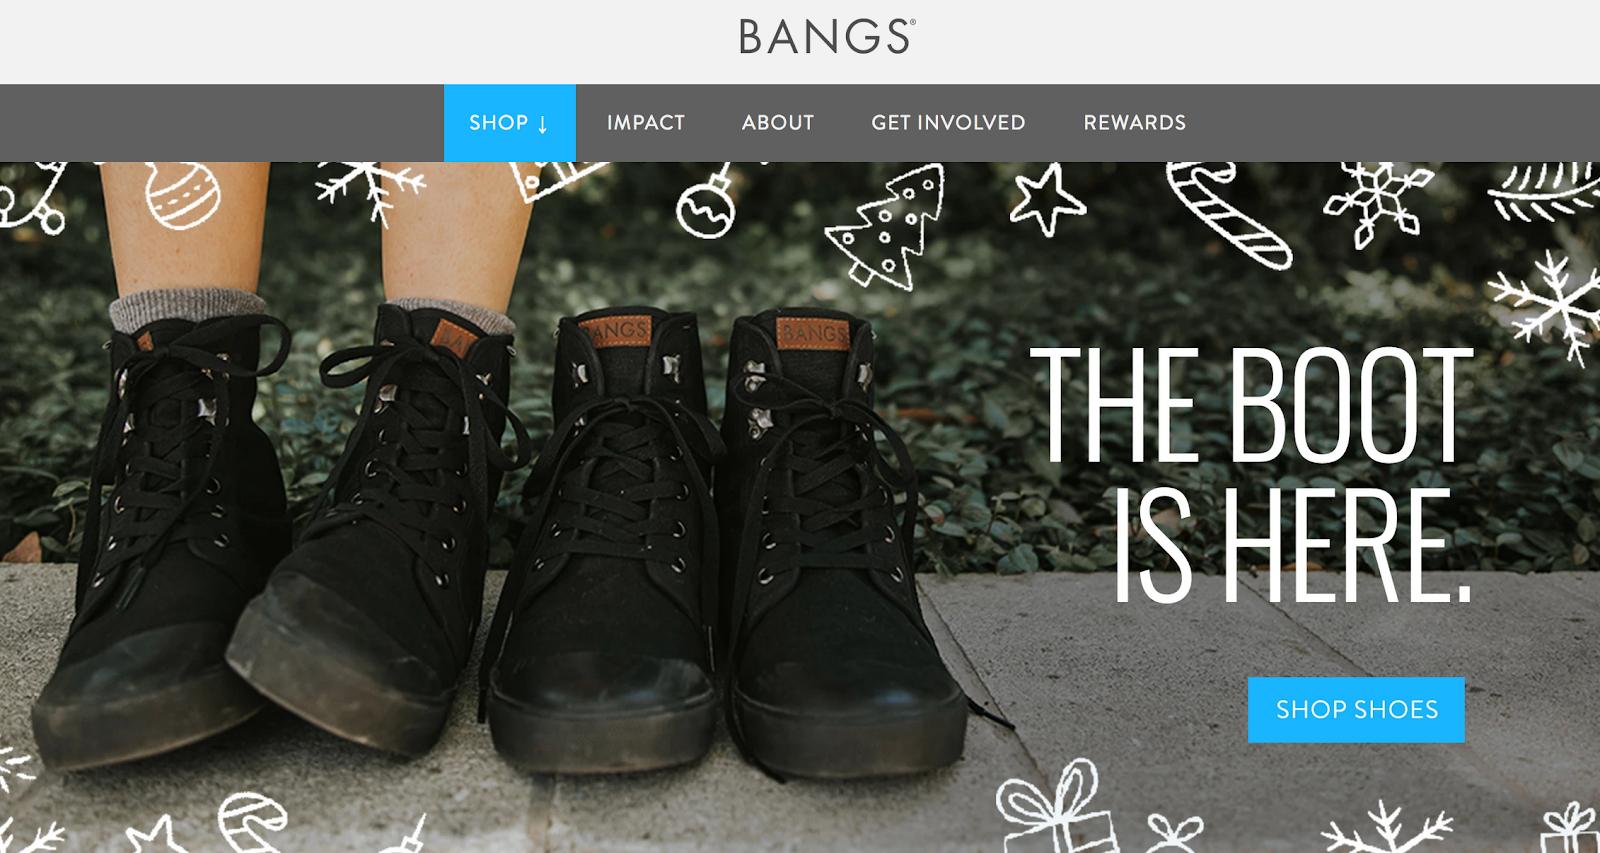 Footwear Brands Looking for Influencers   BANGS Shoes